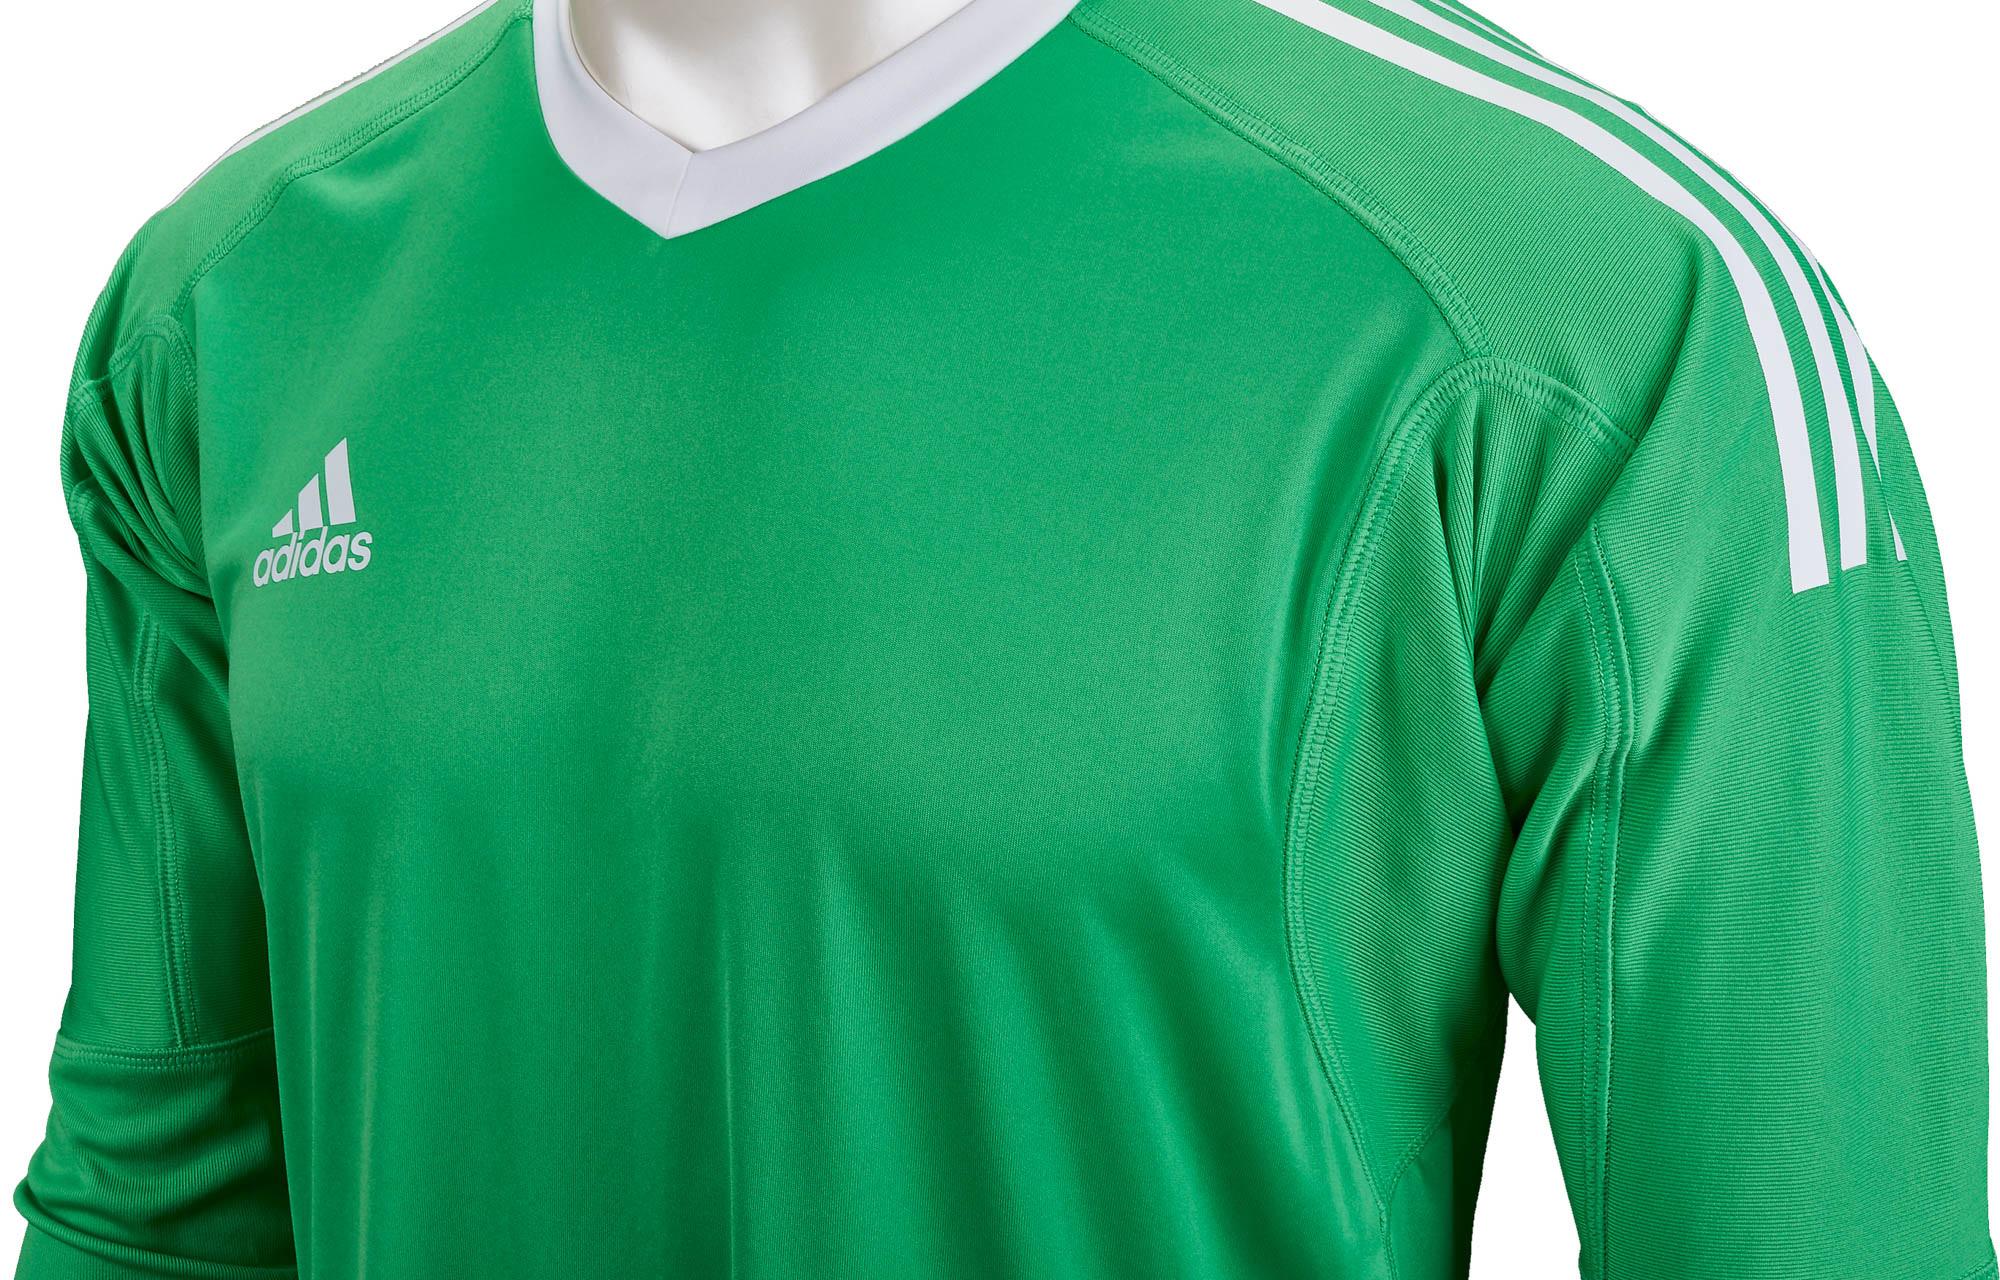 adidas Revigo 17 Goalkeeper Jersey – Energy Green White 1582f5444